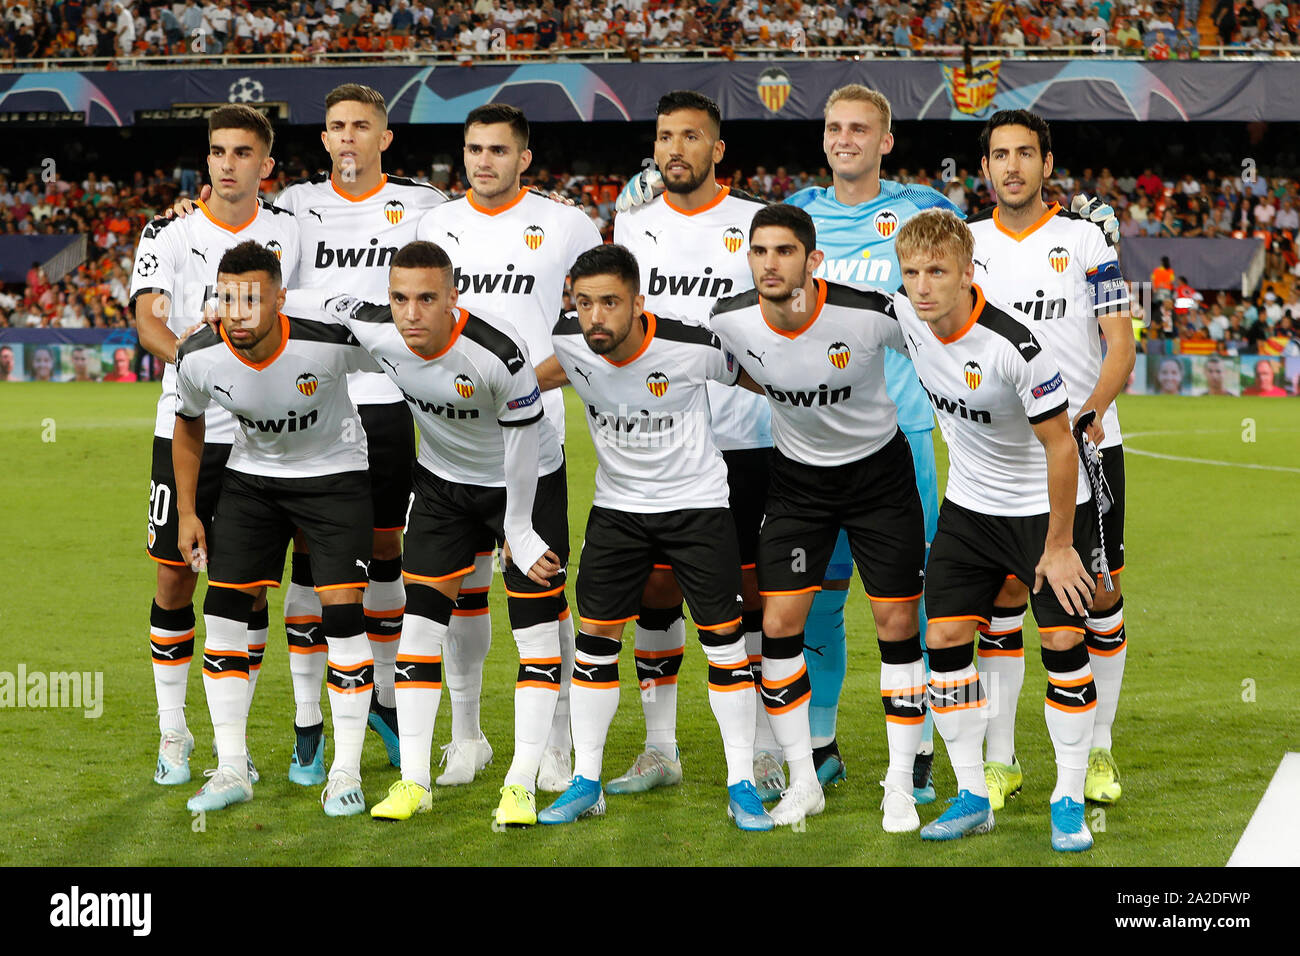 Валенсия команда футбол